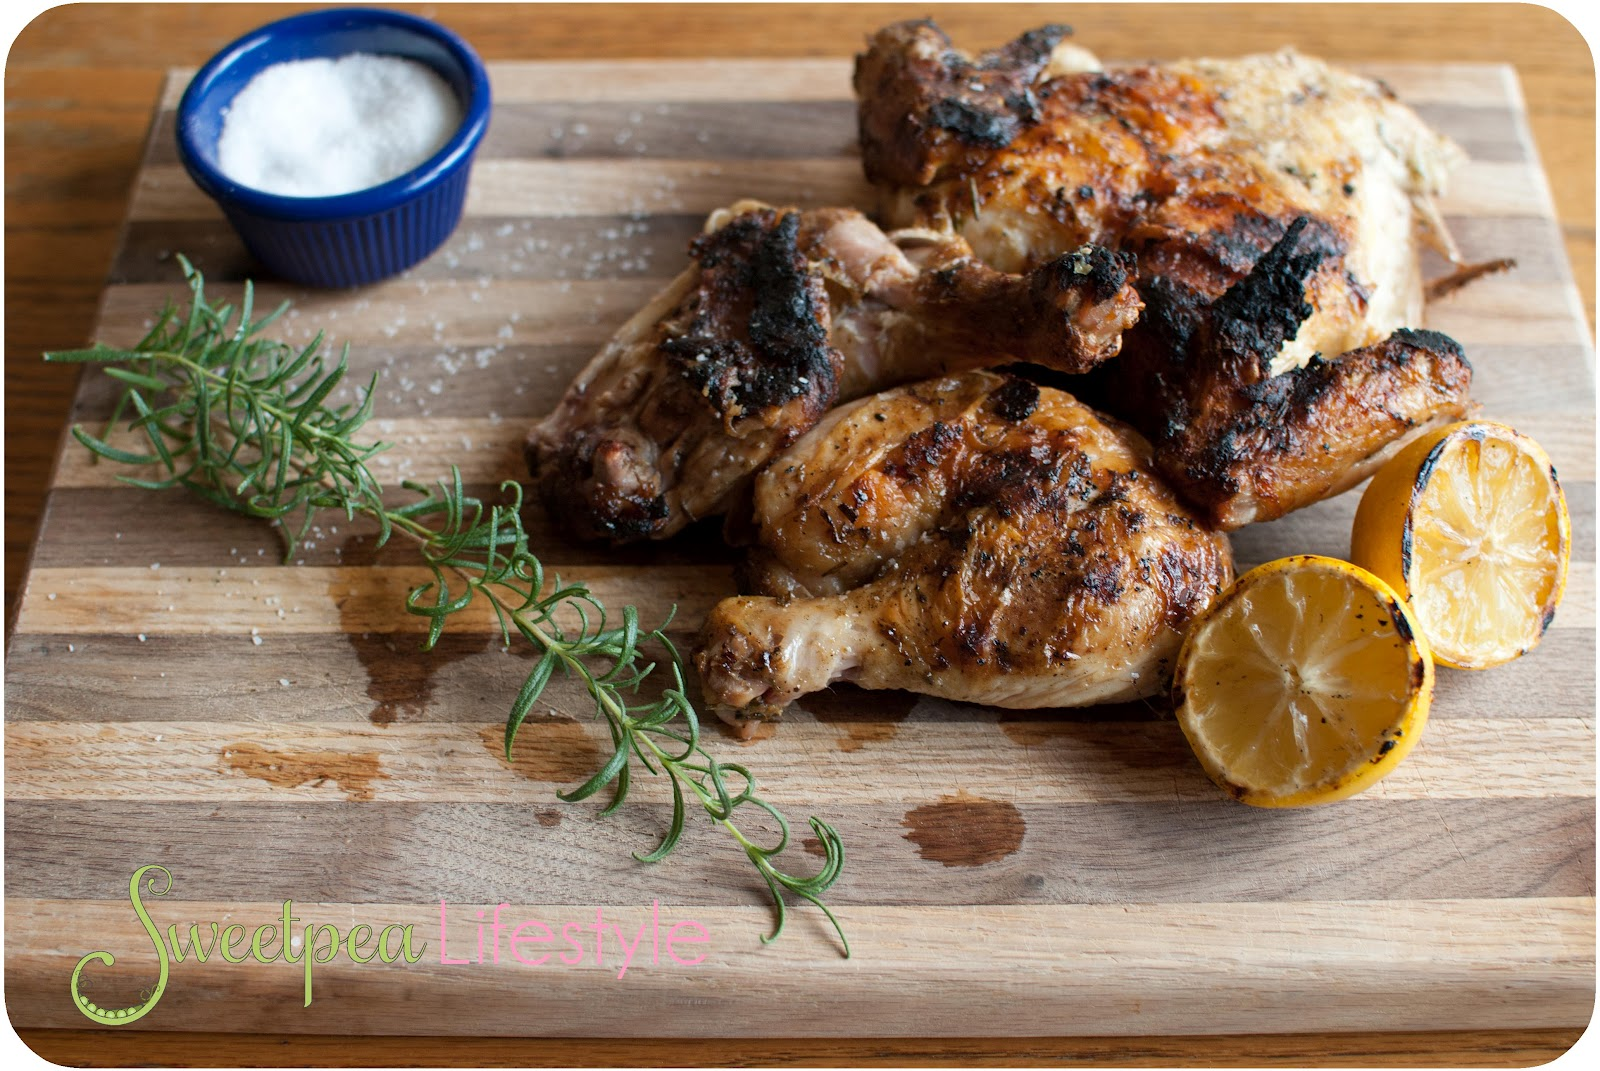 Tuscan Lemon Chicken Sweetpea Lifestyle